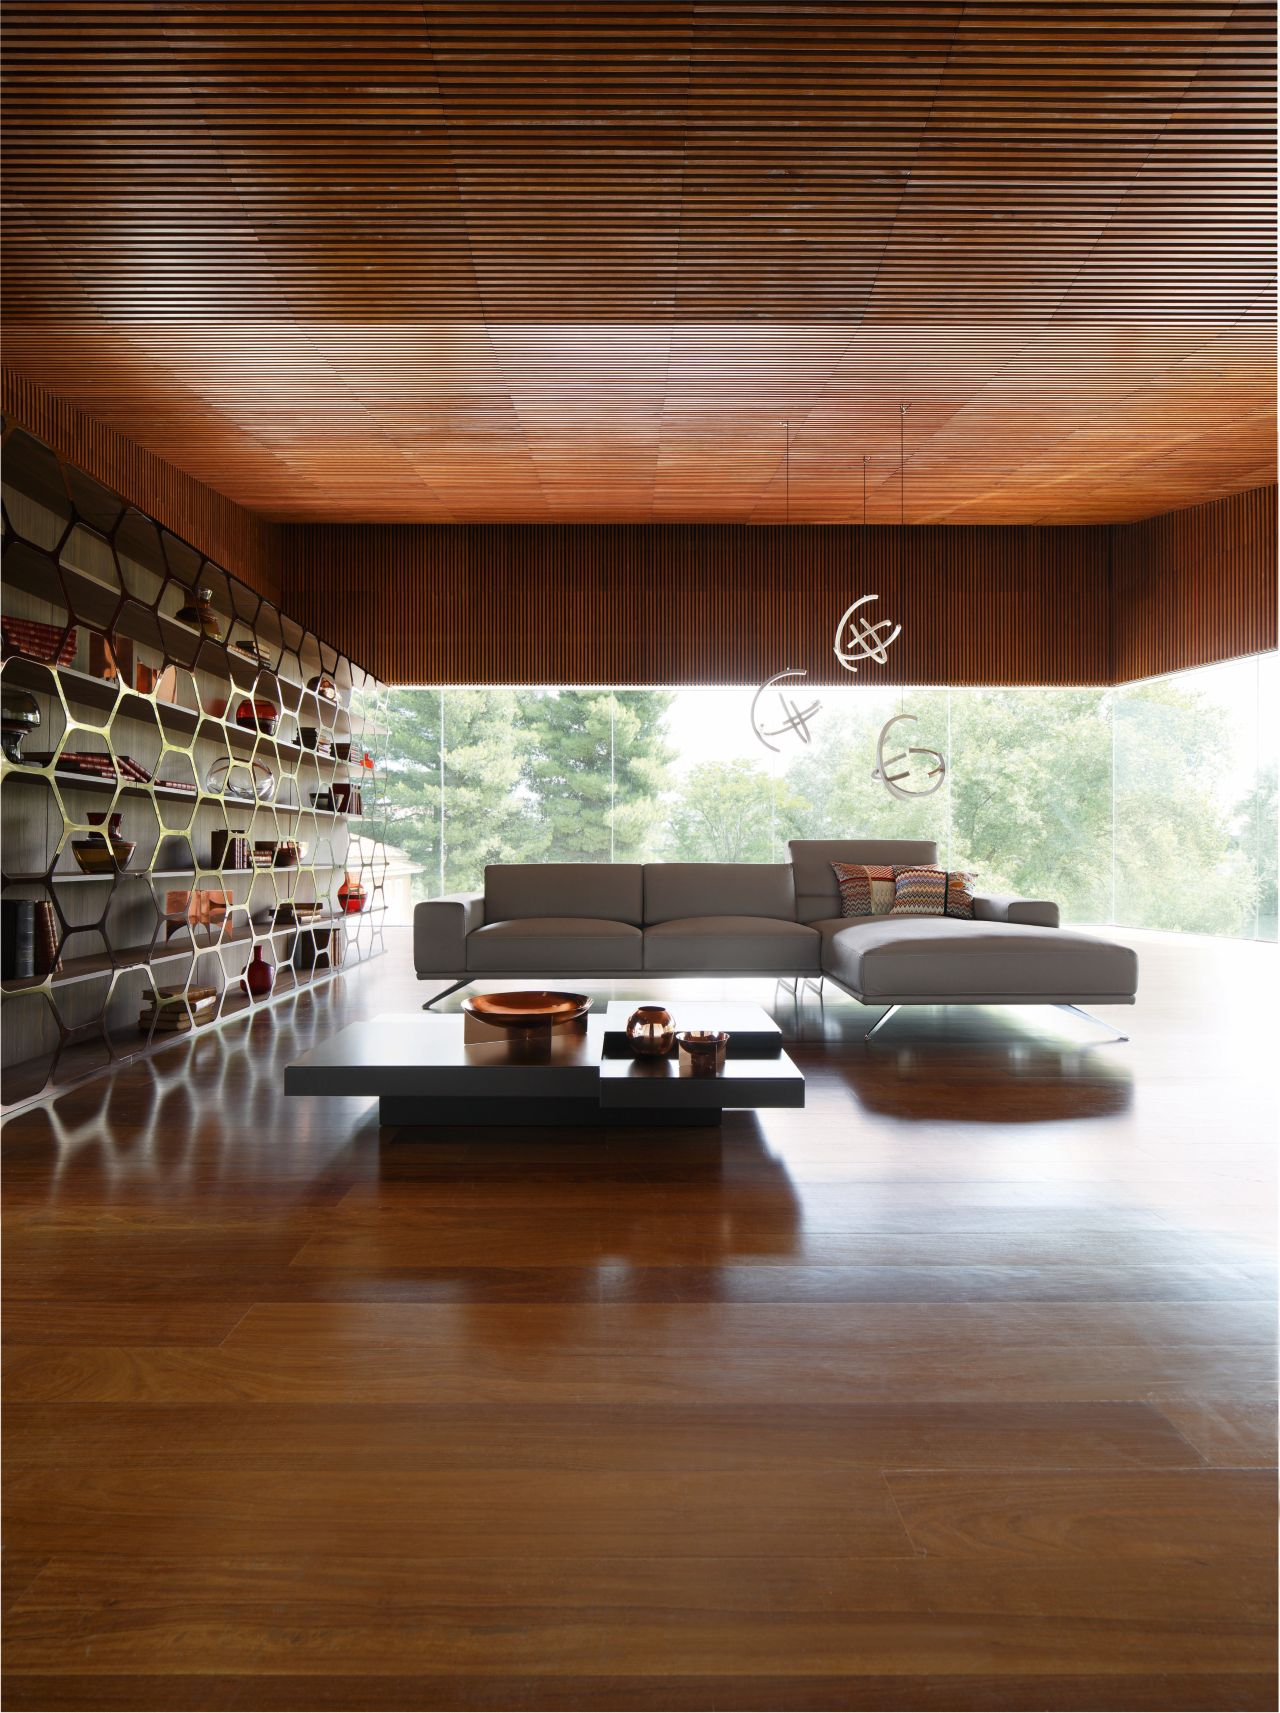 pollen libreria roche bobois. Black Bedroom Furniture Sets. Home Design Ideas